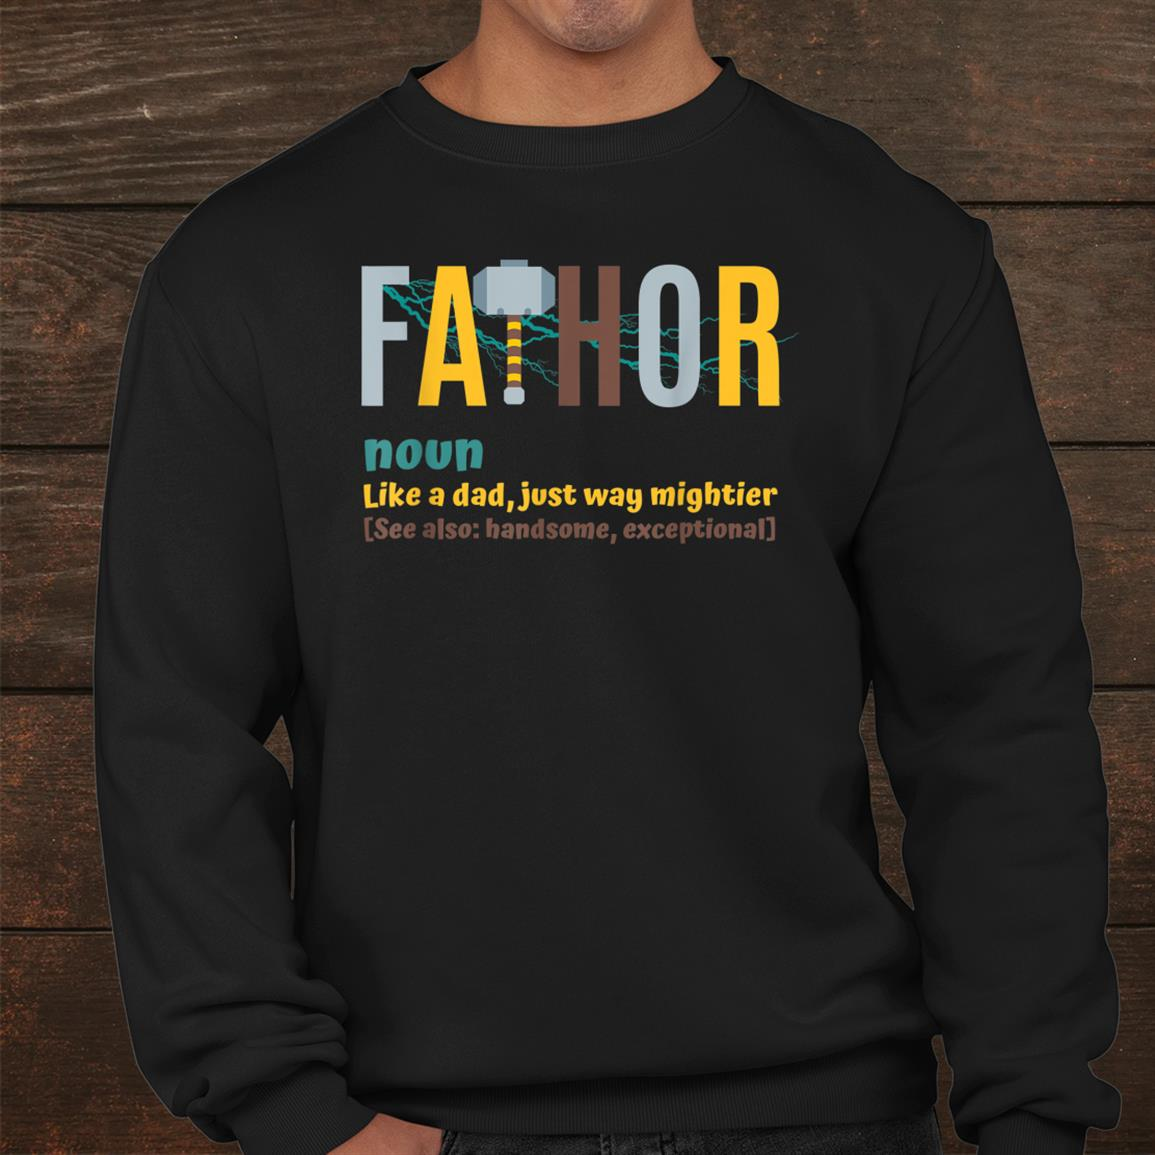 Fathor Shirts For Men Gift Viking Fathor Hero Shirt